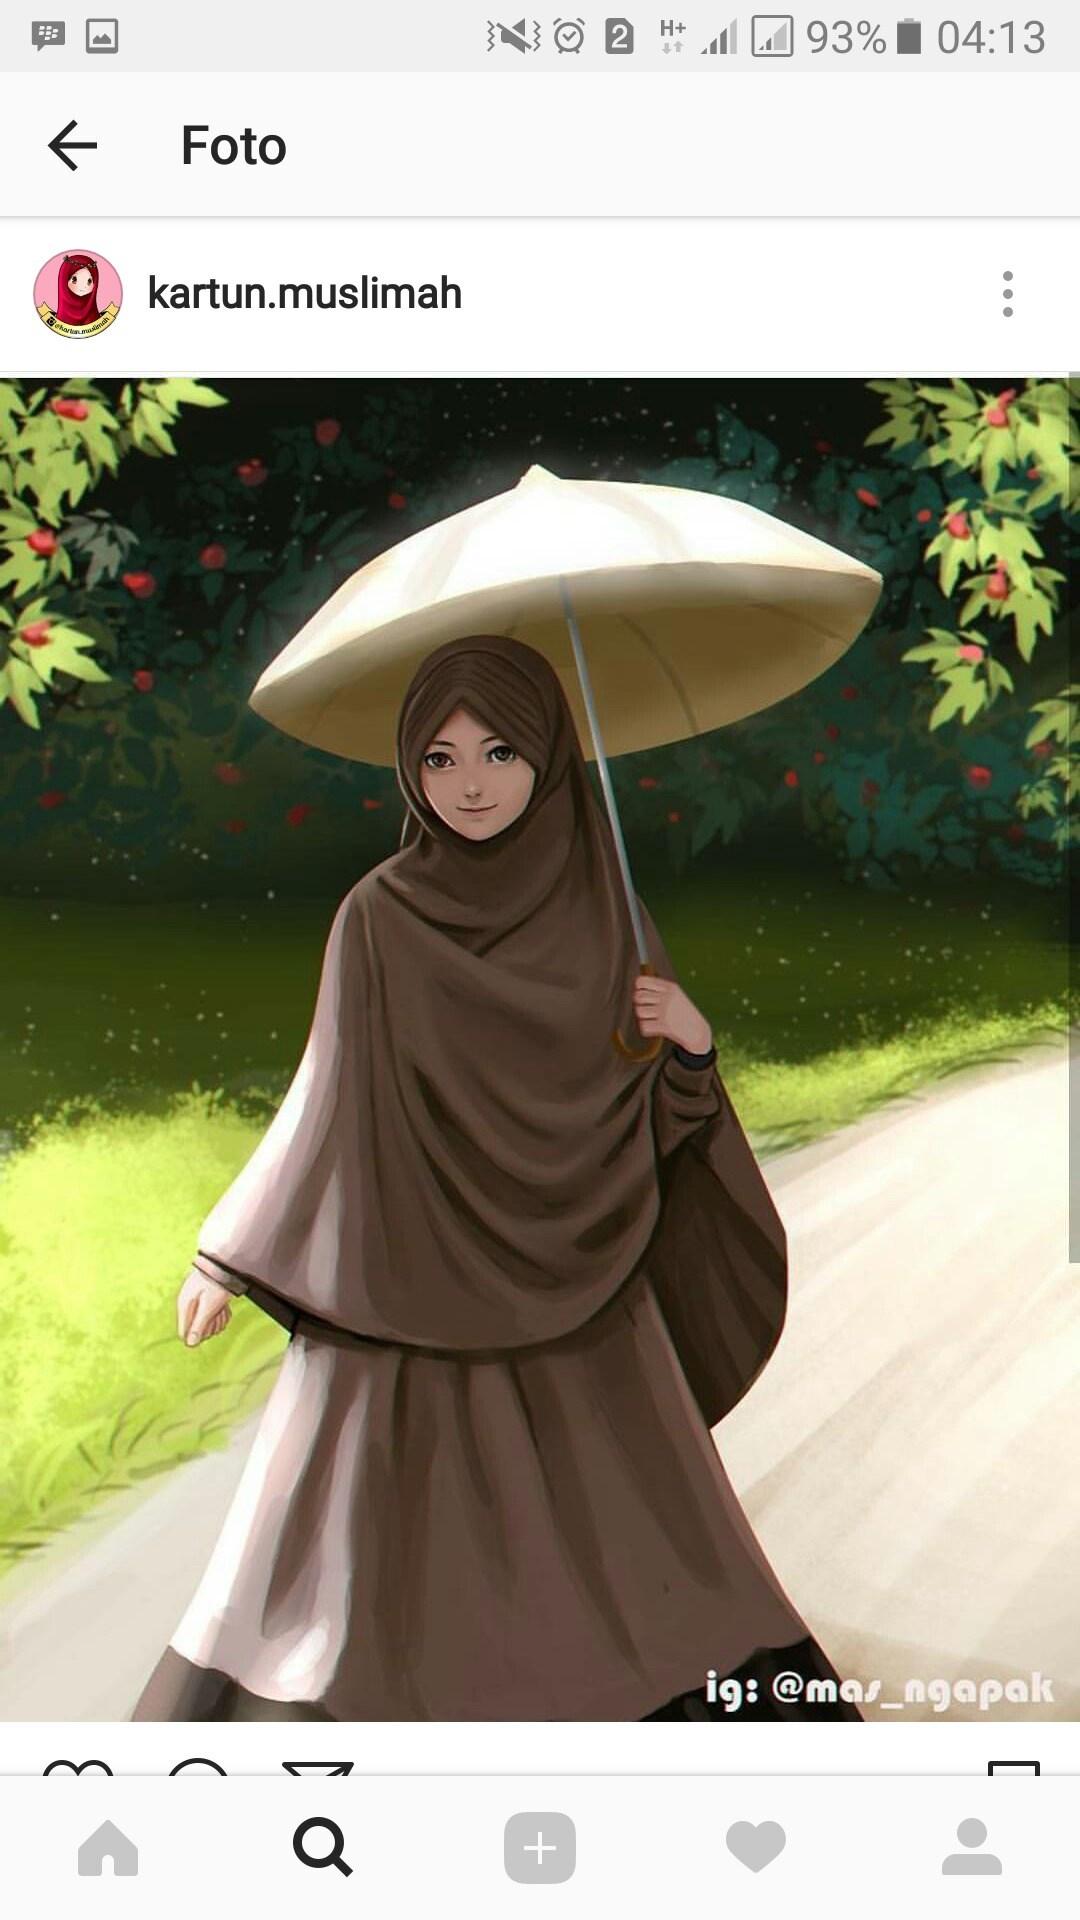 Gambar Kartun Wanita Muslimah Dari Belakang Terbaru Ansyf Ardiyanursifah Likes Askfm